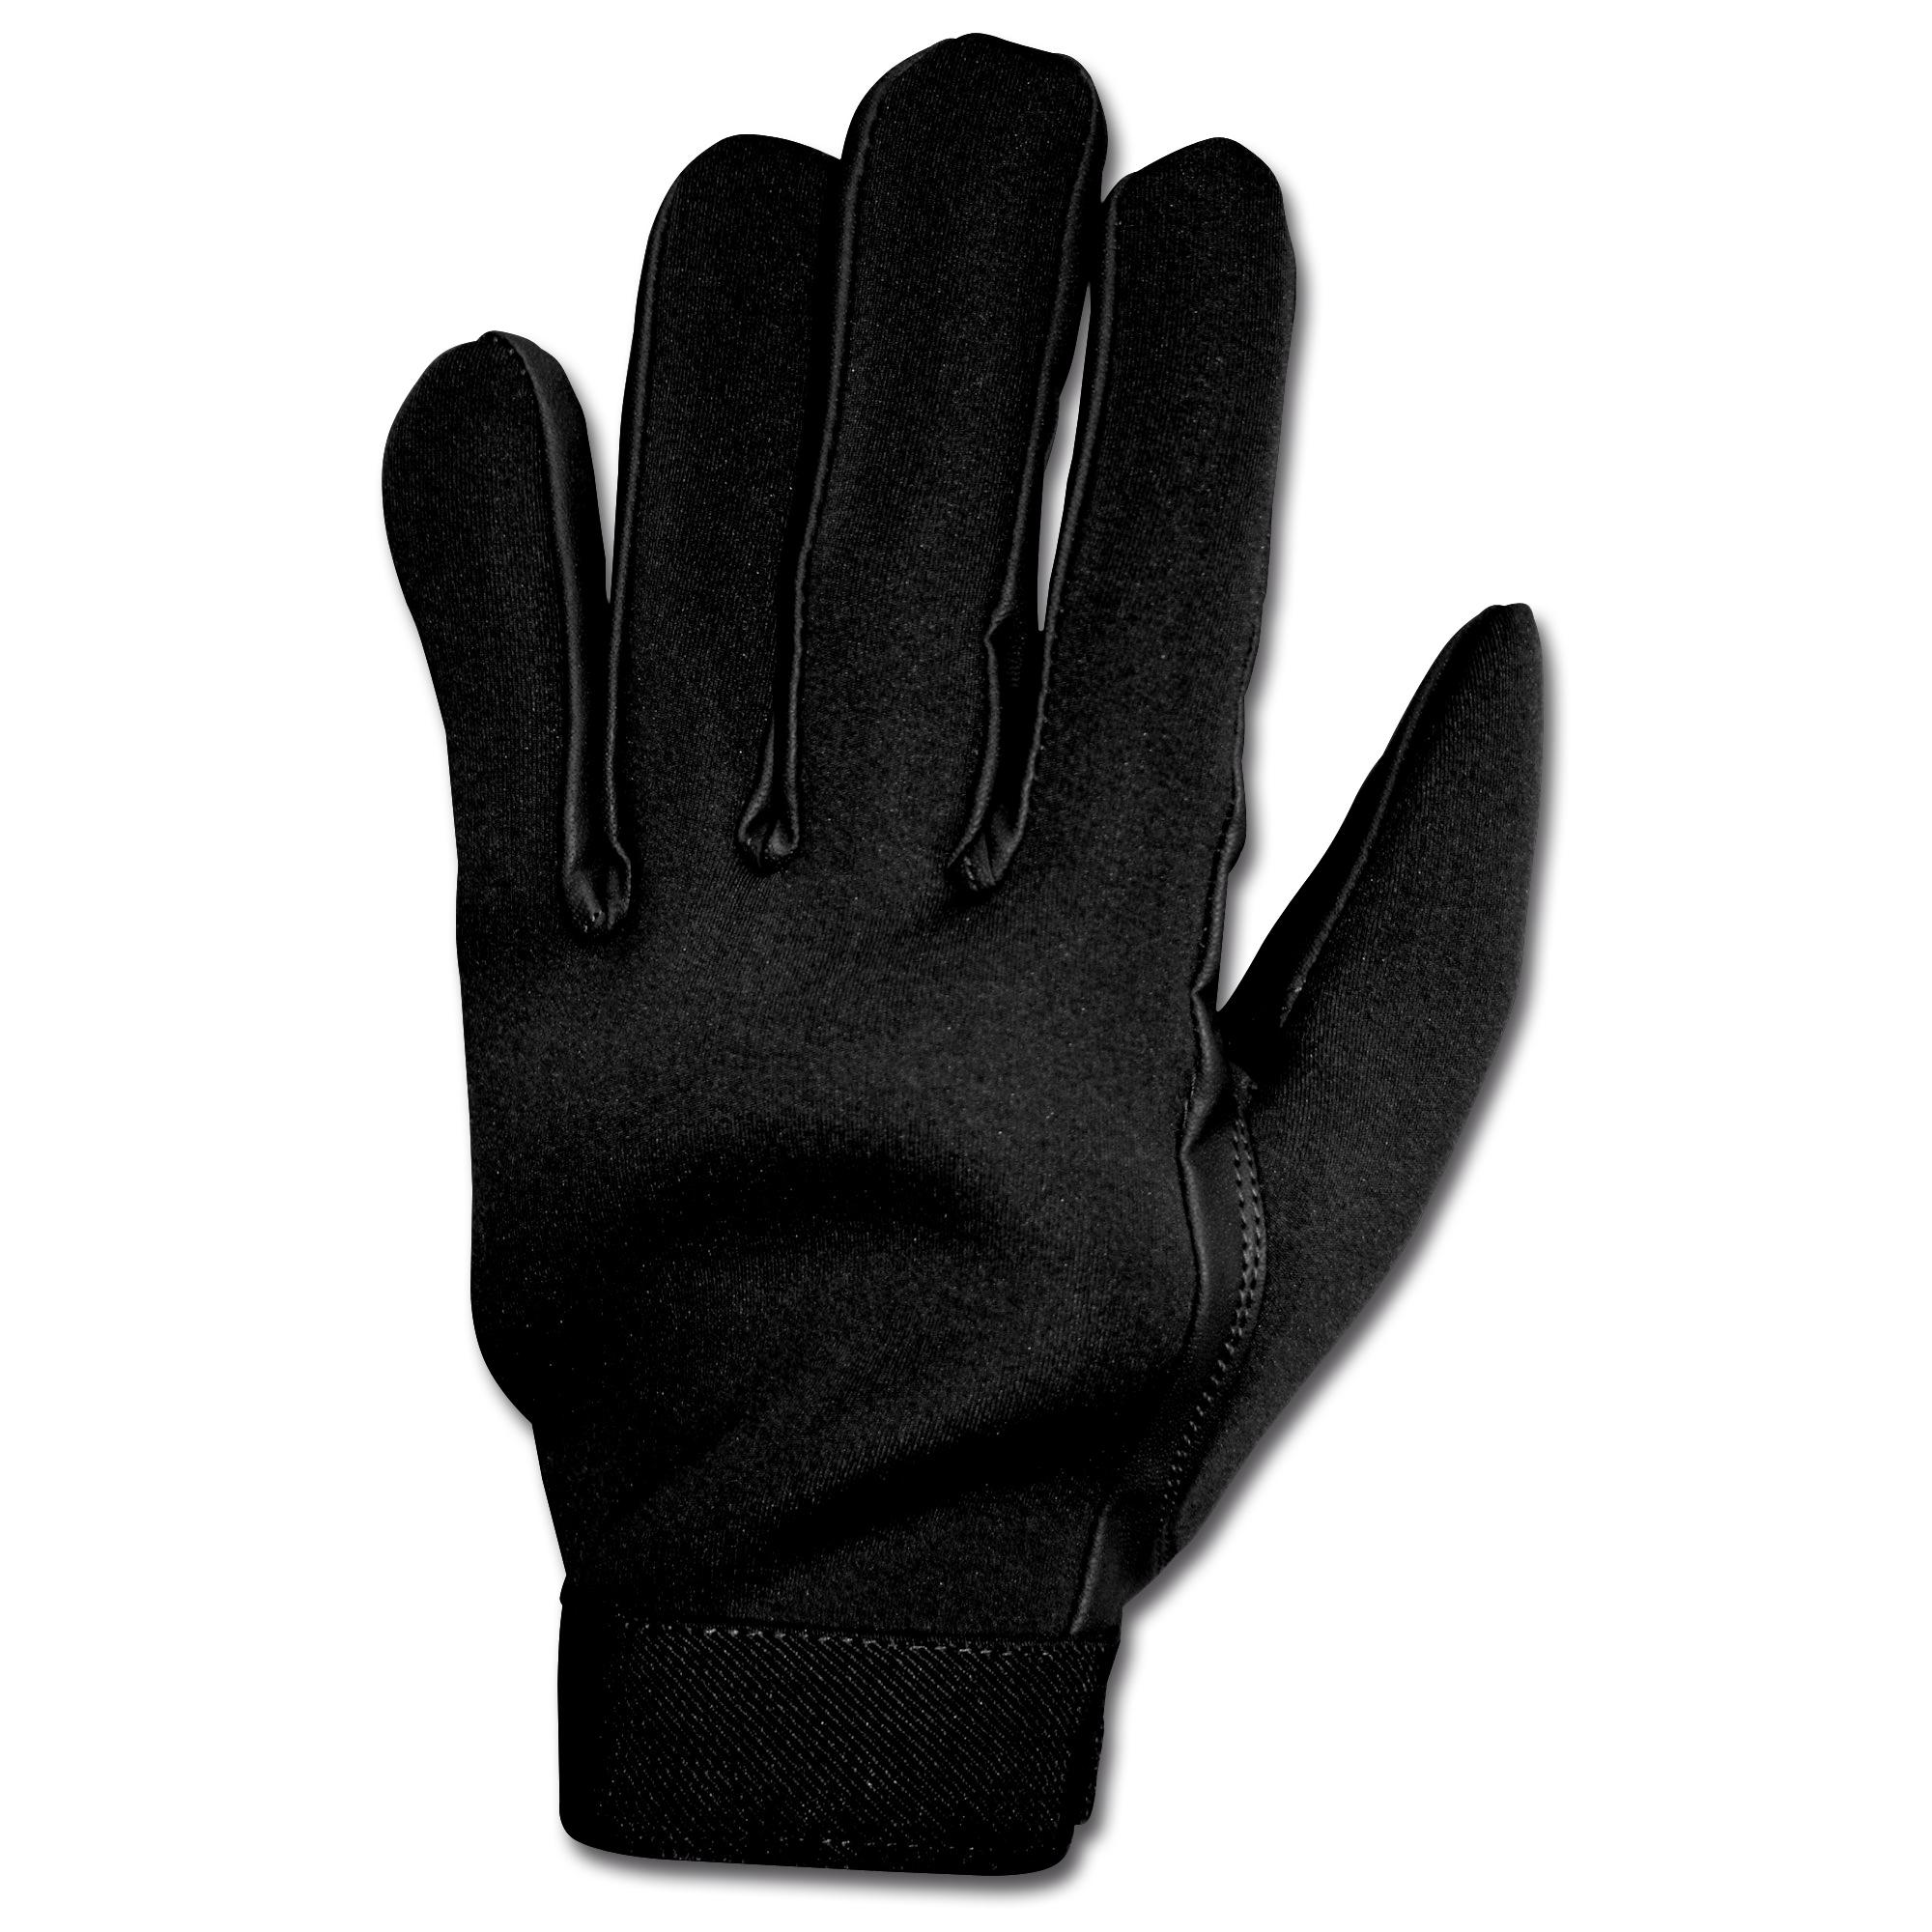 Neopren Fingerhandschuhe Profi schwarz